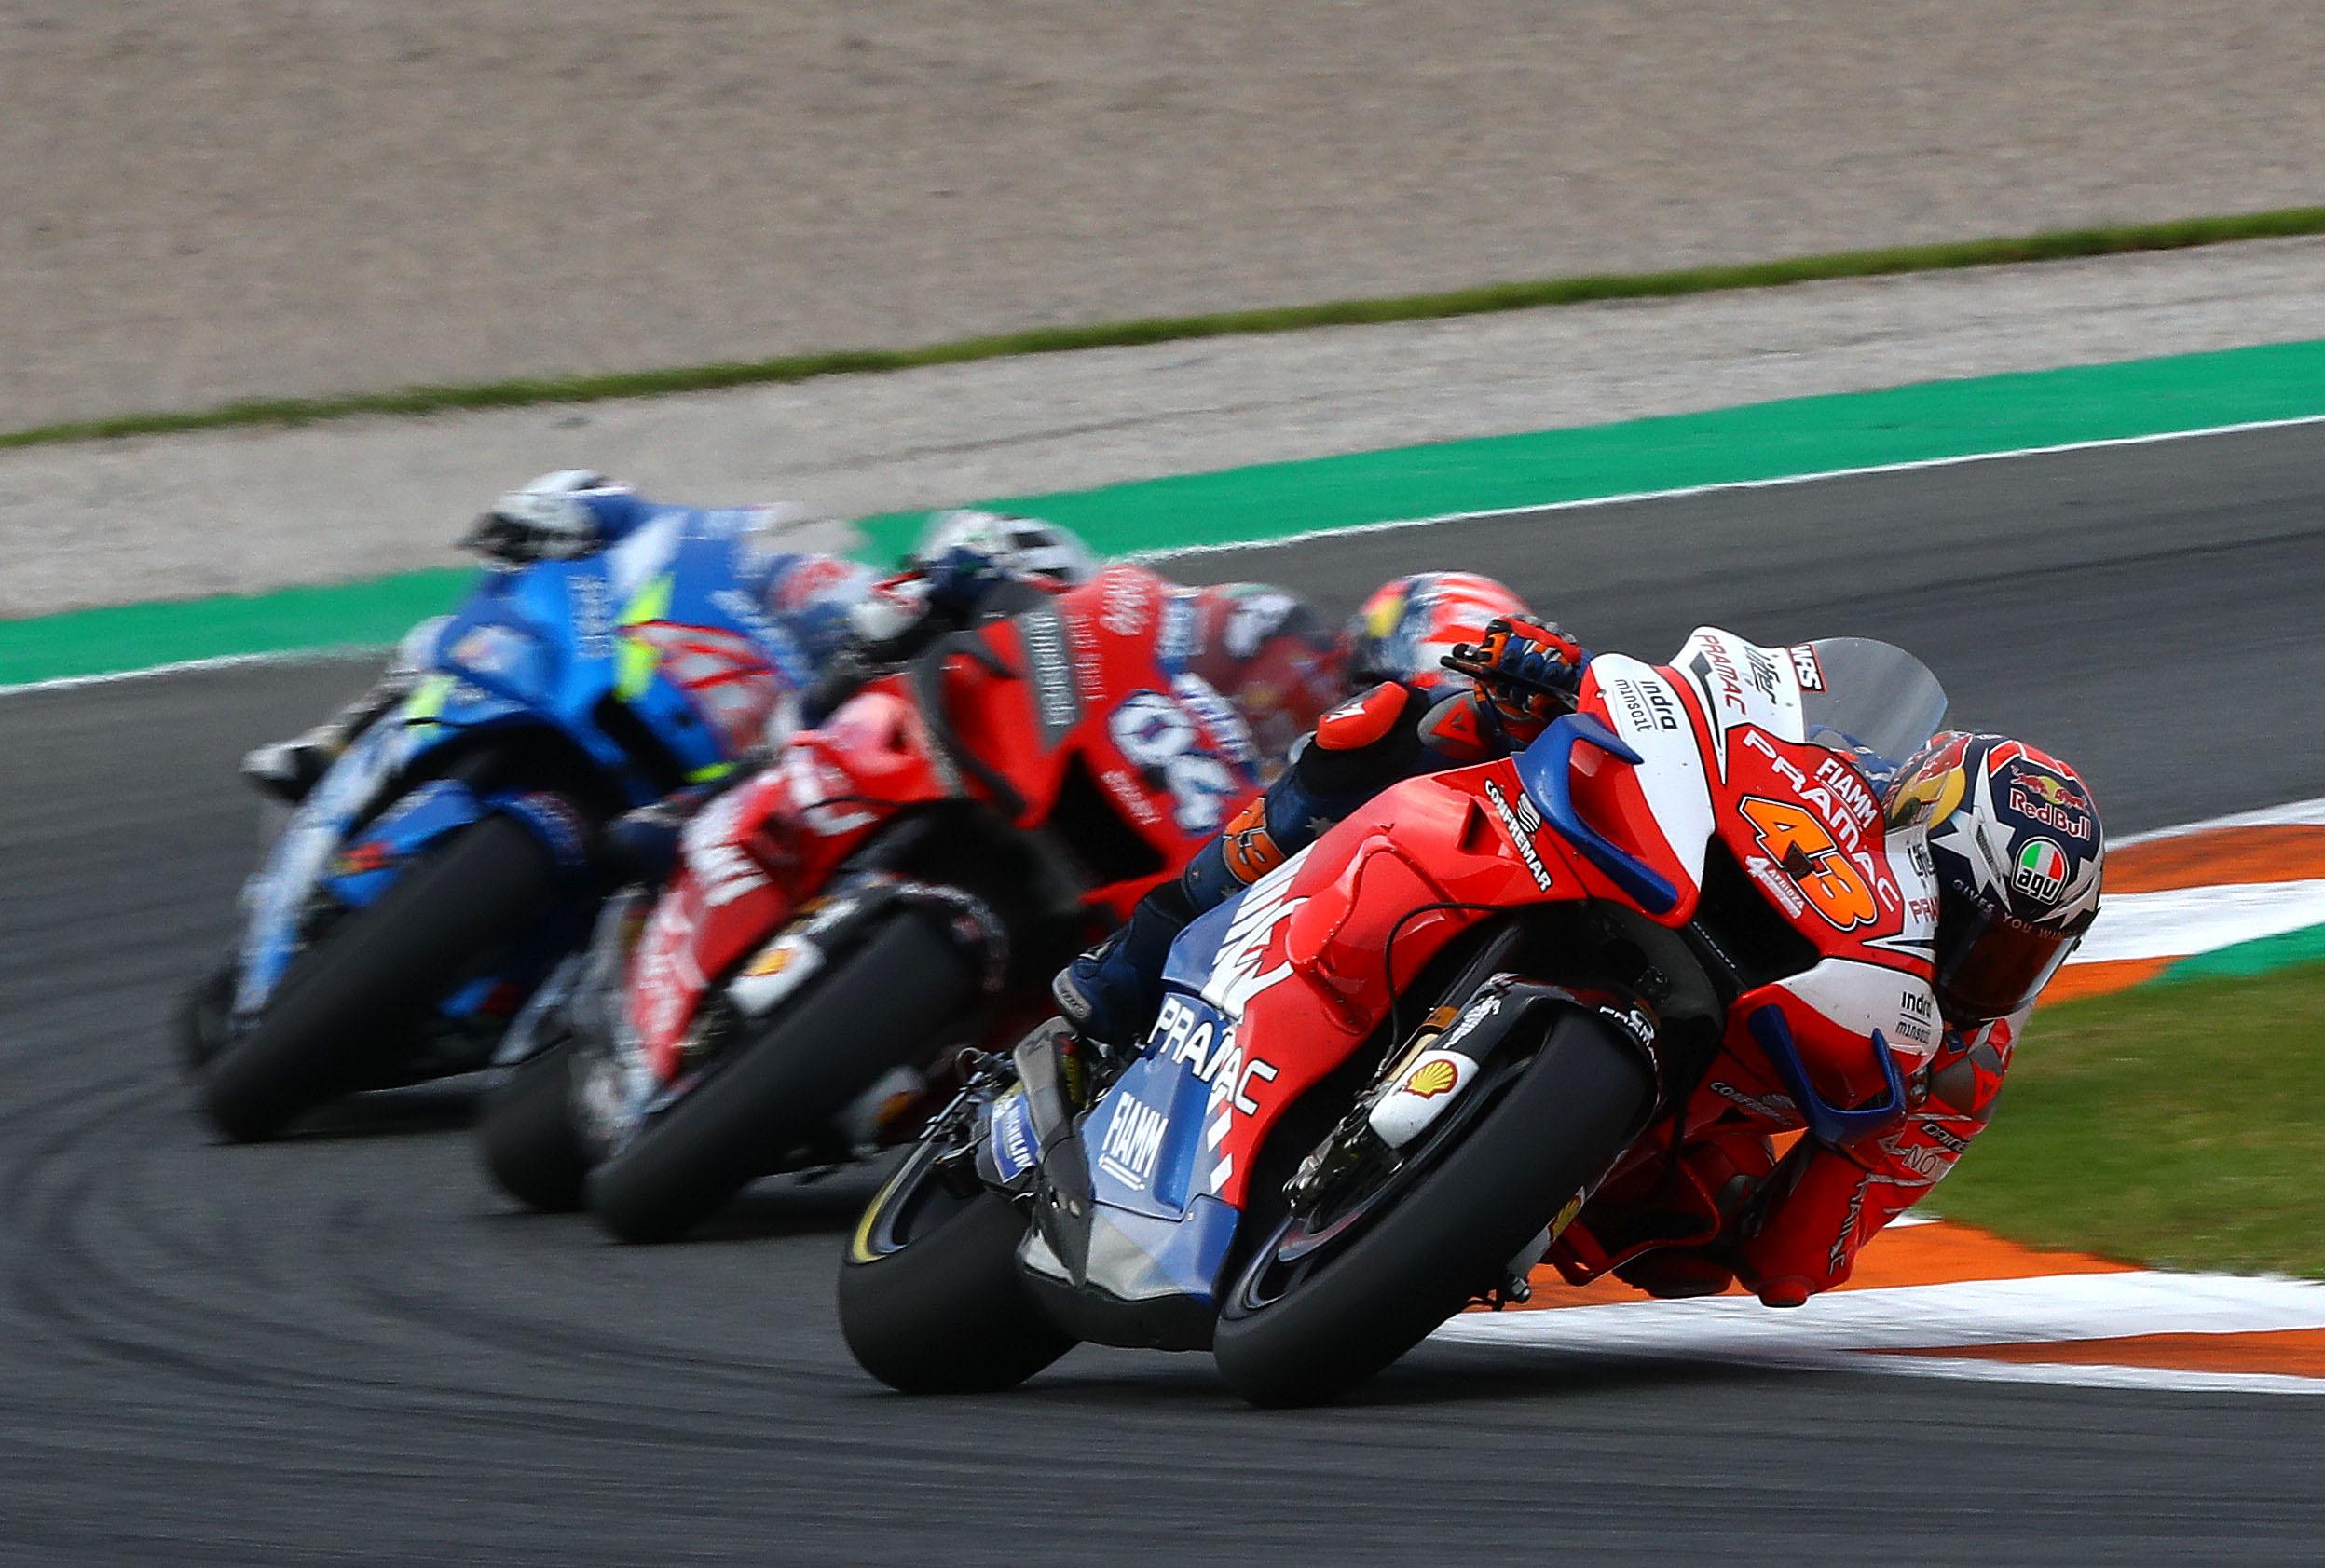 Jack Miller Pramac Ducati Valencia MotoGP 2019